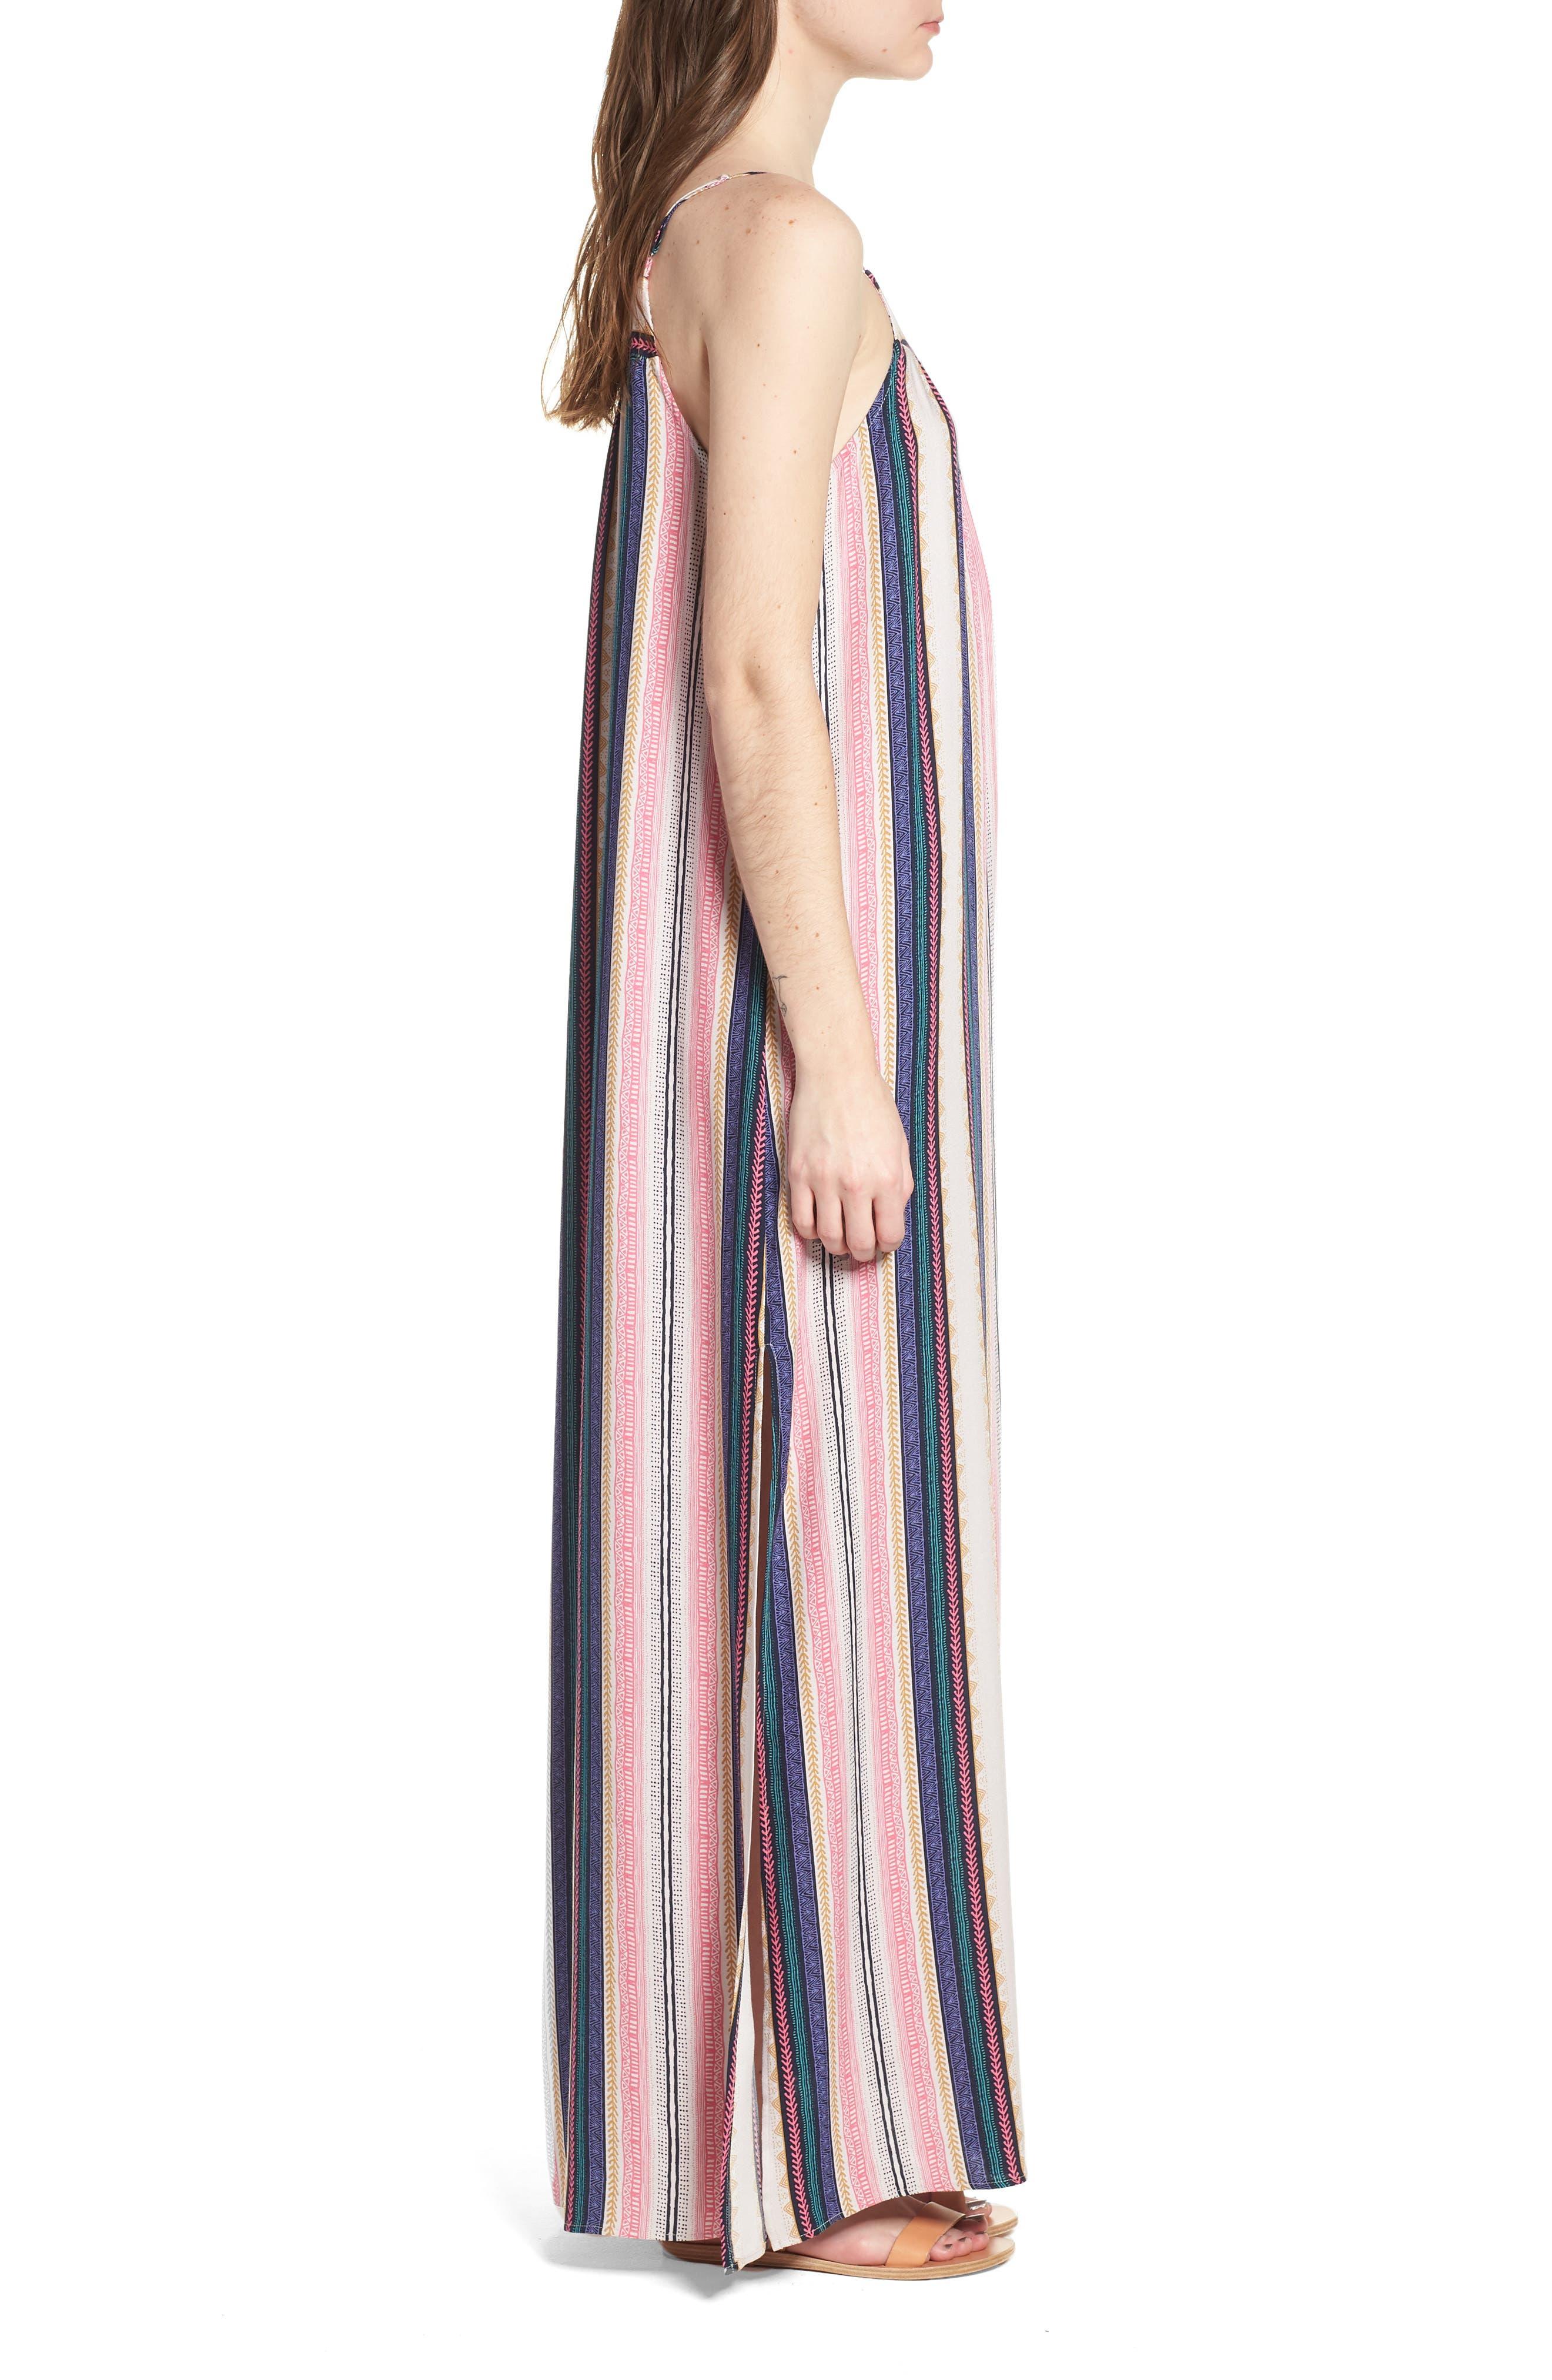 ONE CLOTHING,                             Stripe Maxi Dress,                             Alternate thumbnail 3, color,                             650